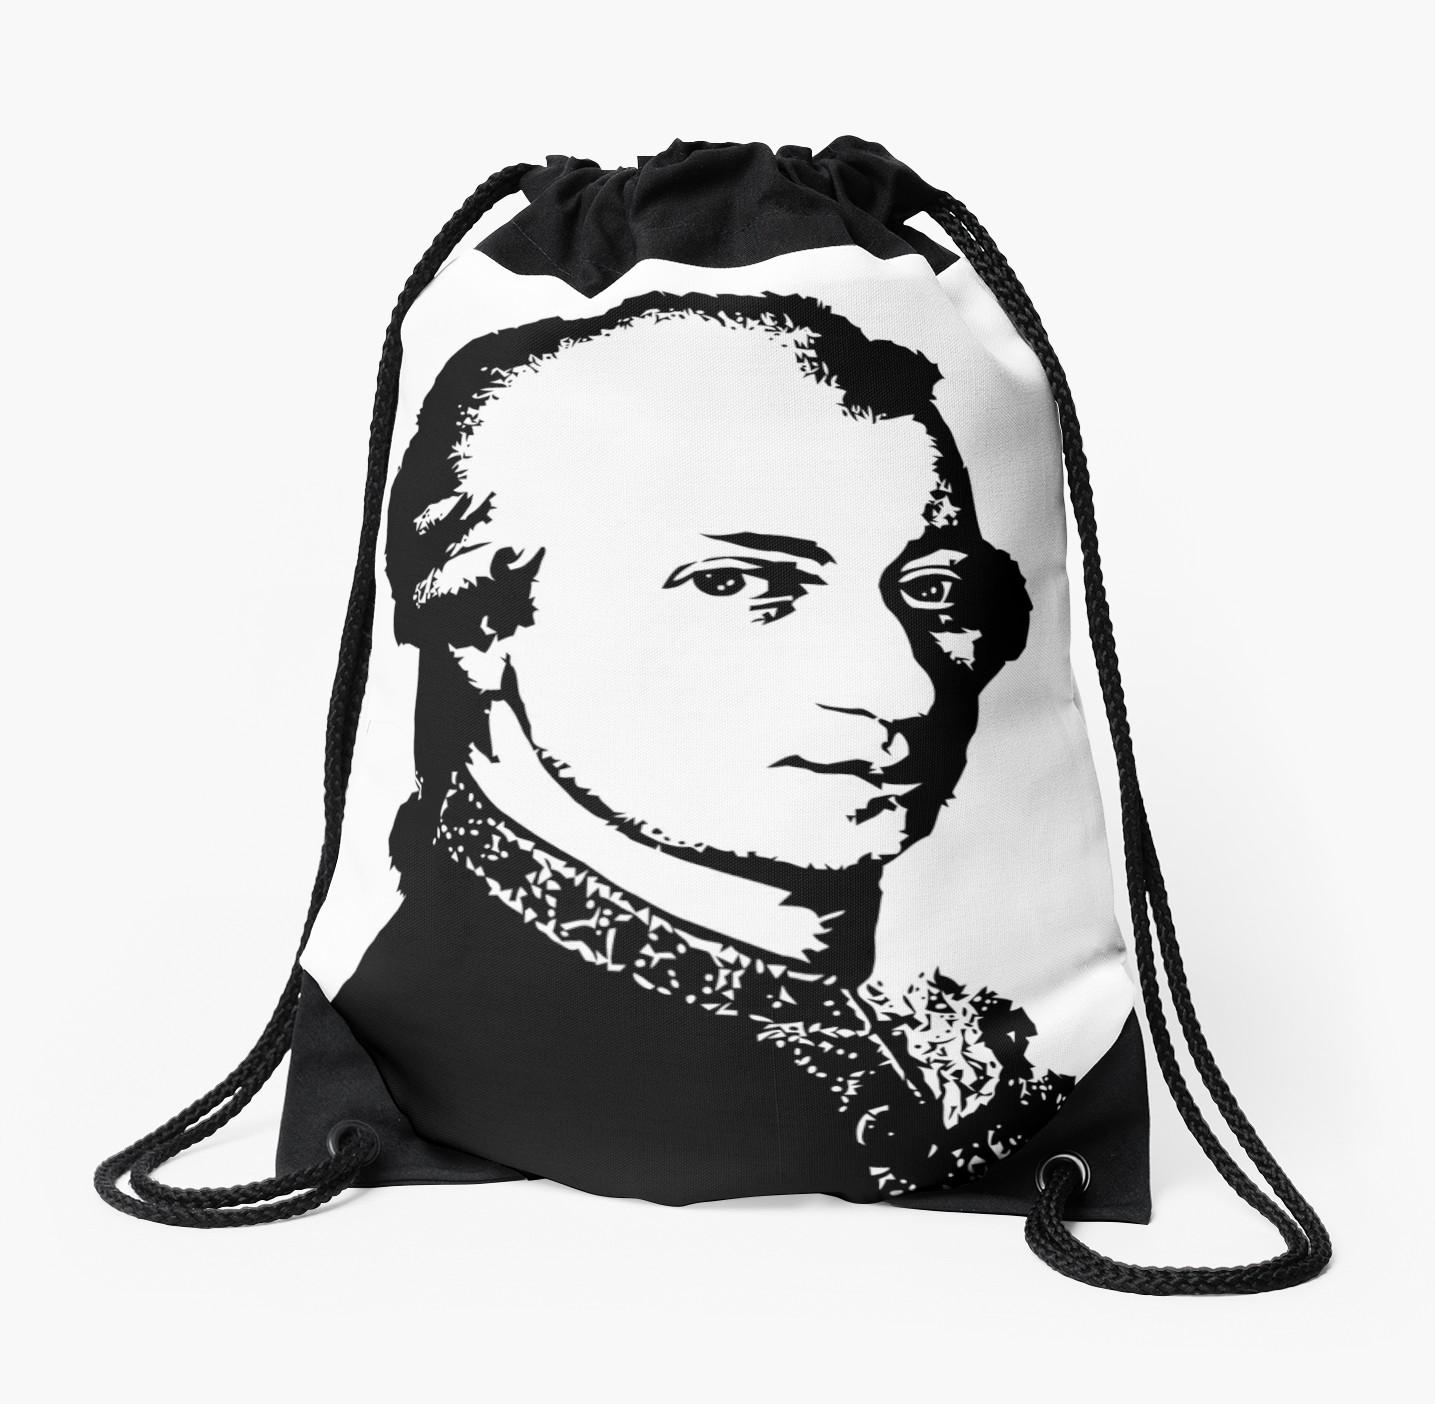 1435x1404 Wolfgang Amadeus Mozart Silhouette Black And White Drawstring